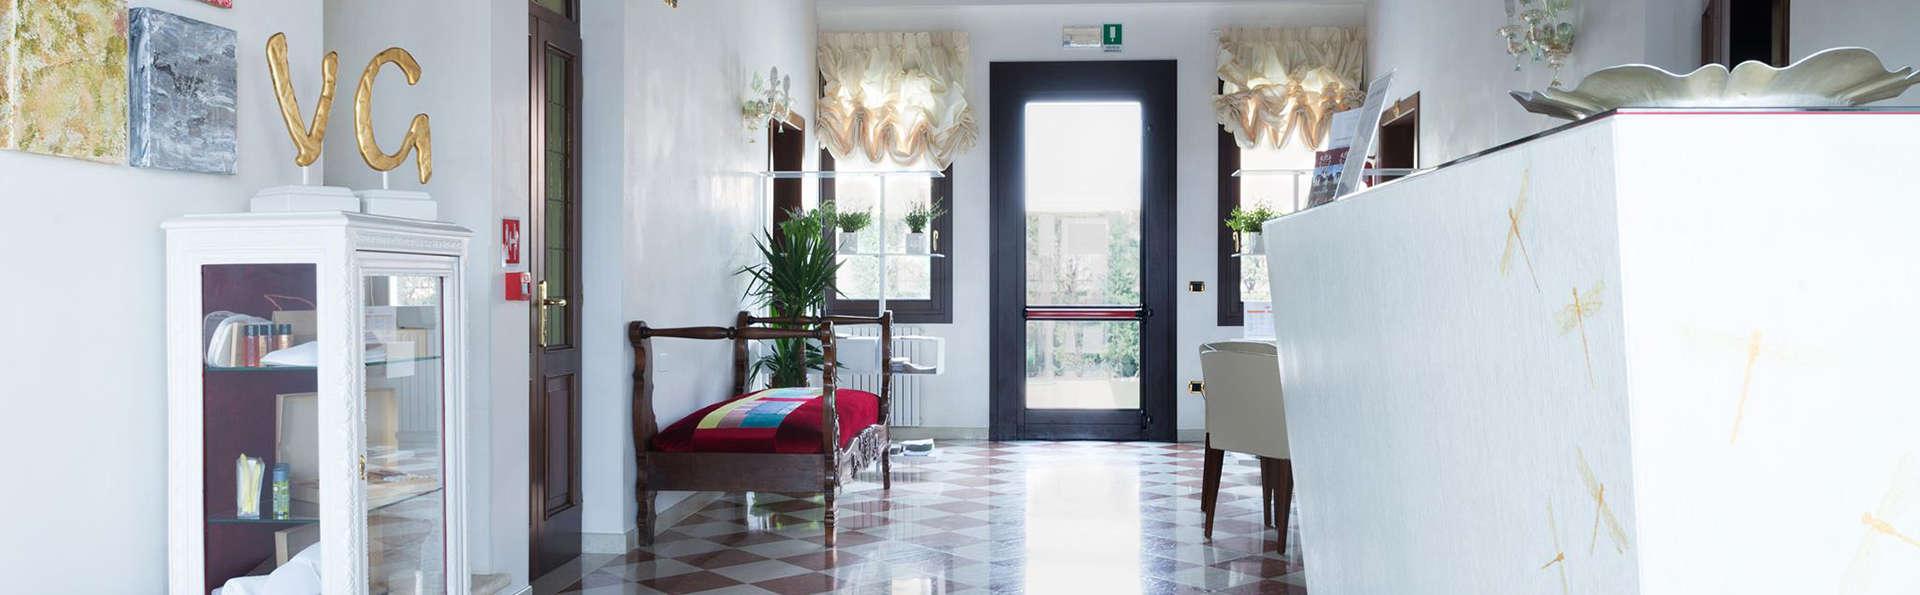 Hotel Villa Gasparini - EDIT_Hall18.jpg